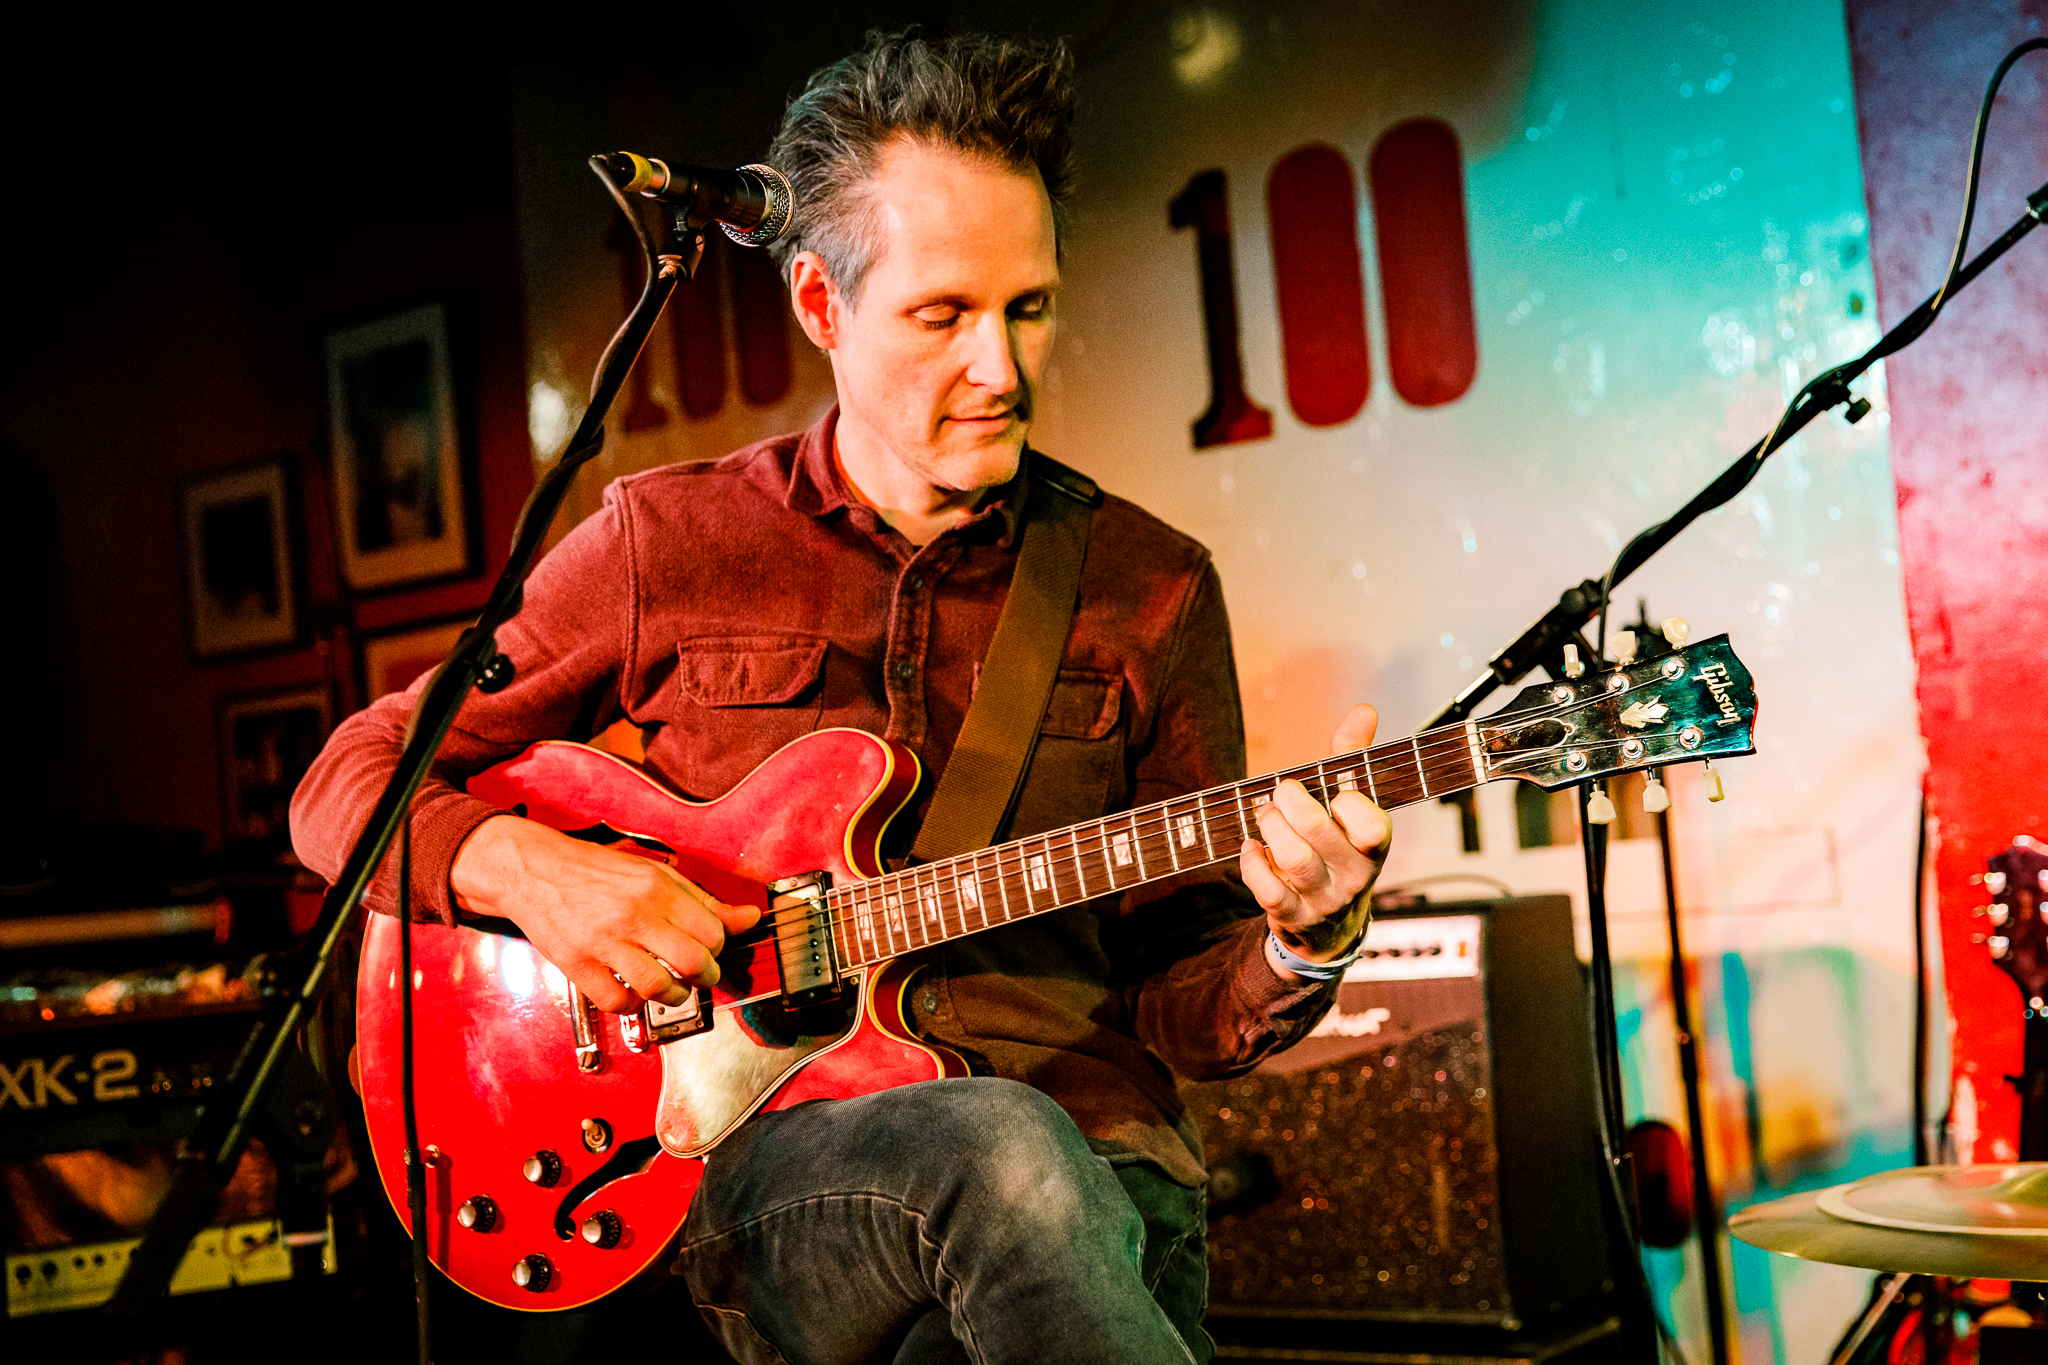 Tim Keegan performing at the 100 Club in London, England - 3/1/2018 (photo by Matt Condon / @arcane93)